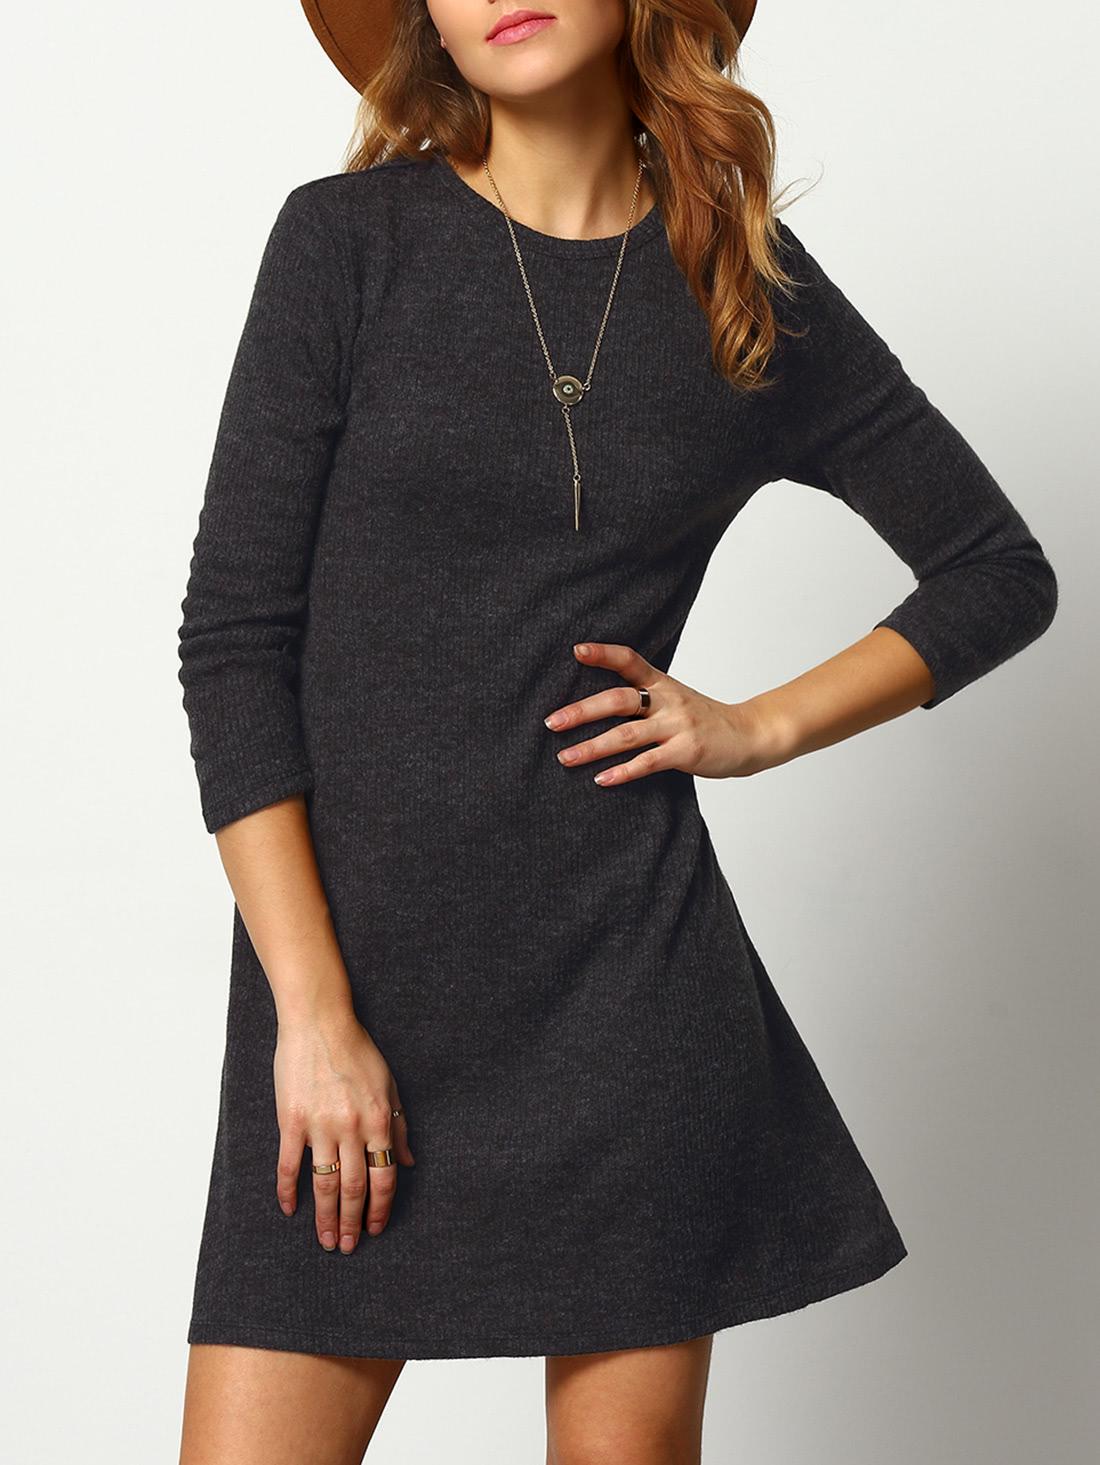 dark grey crew neck casual sweater dress. Black Bedroom Furniture Sets. Home Design Ideas